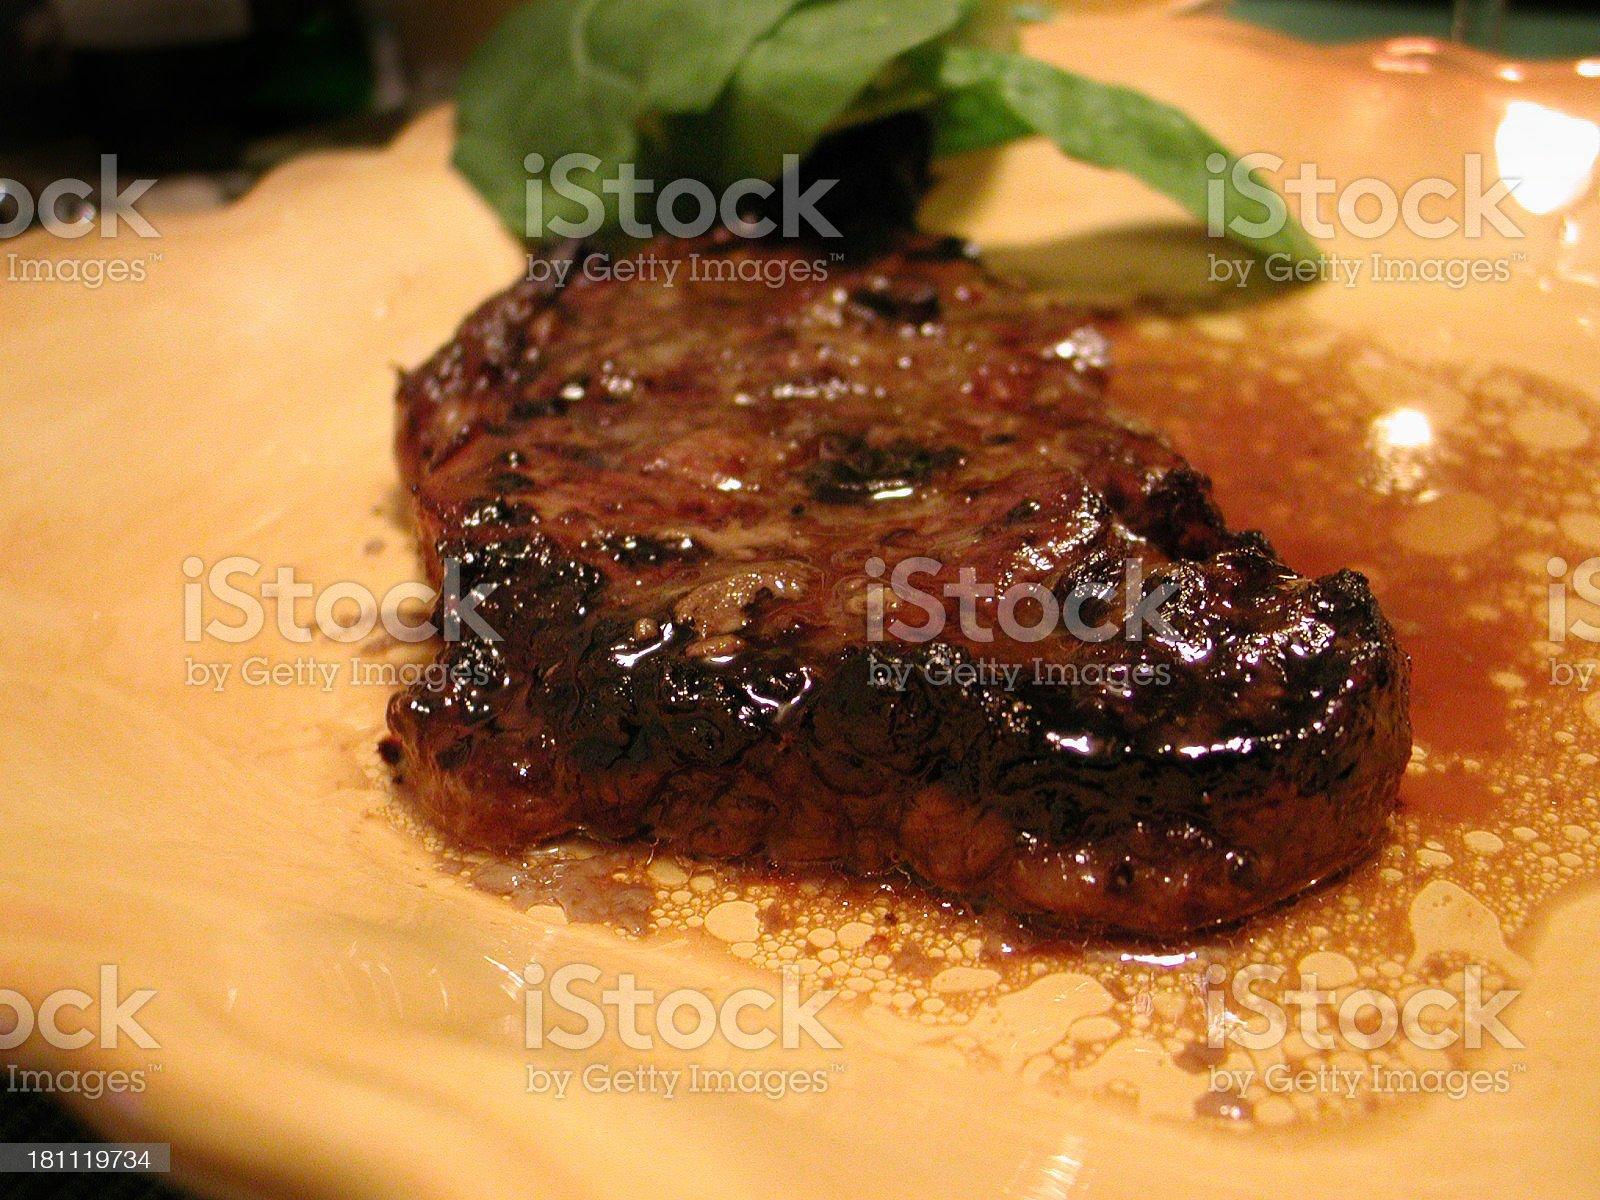 Juicy steak 2 royalty-free stock photo